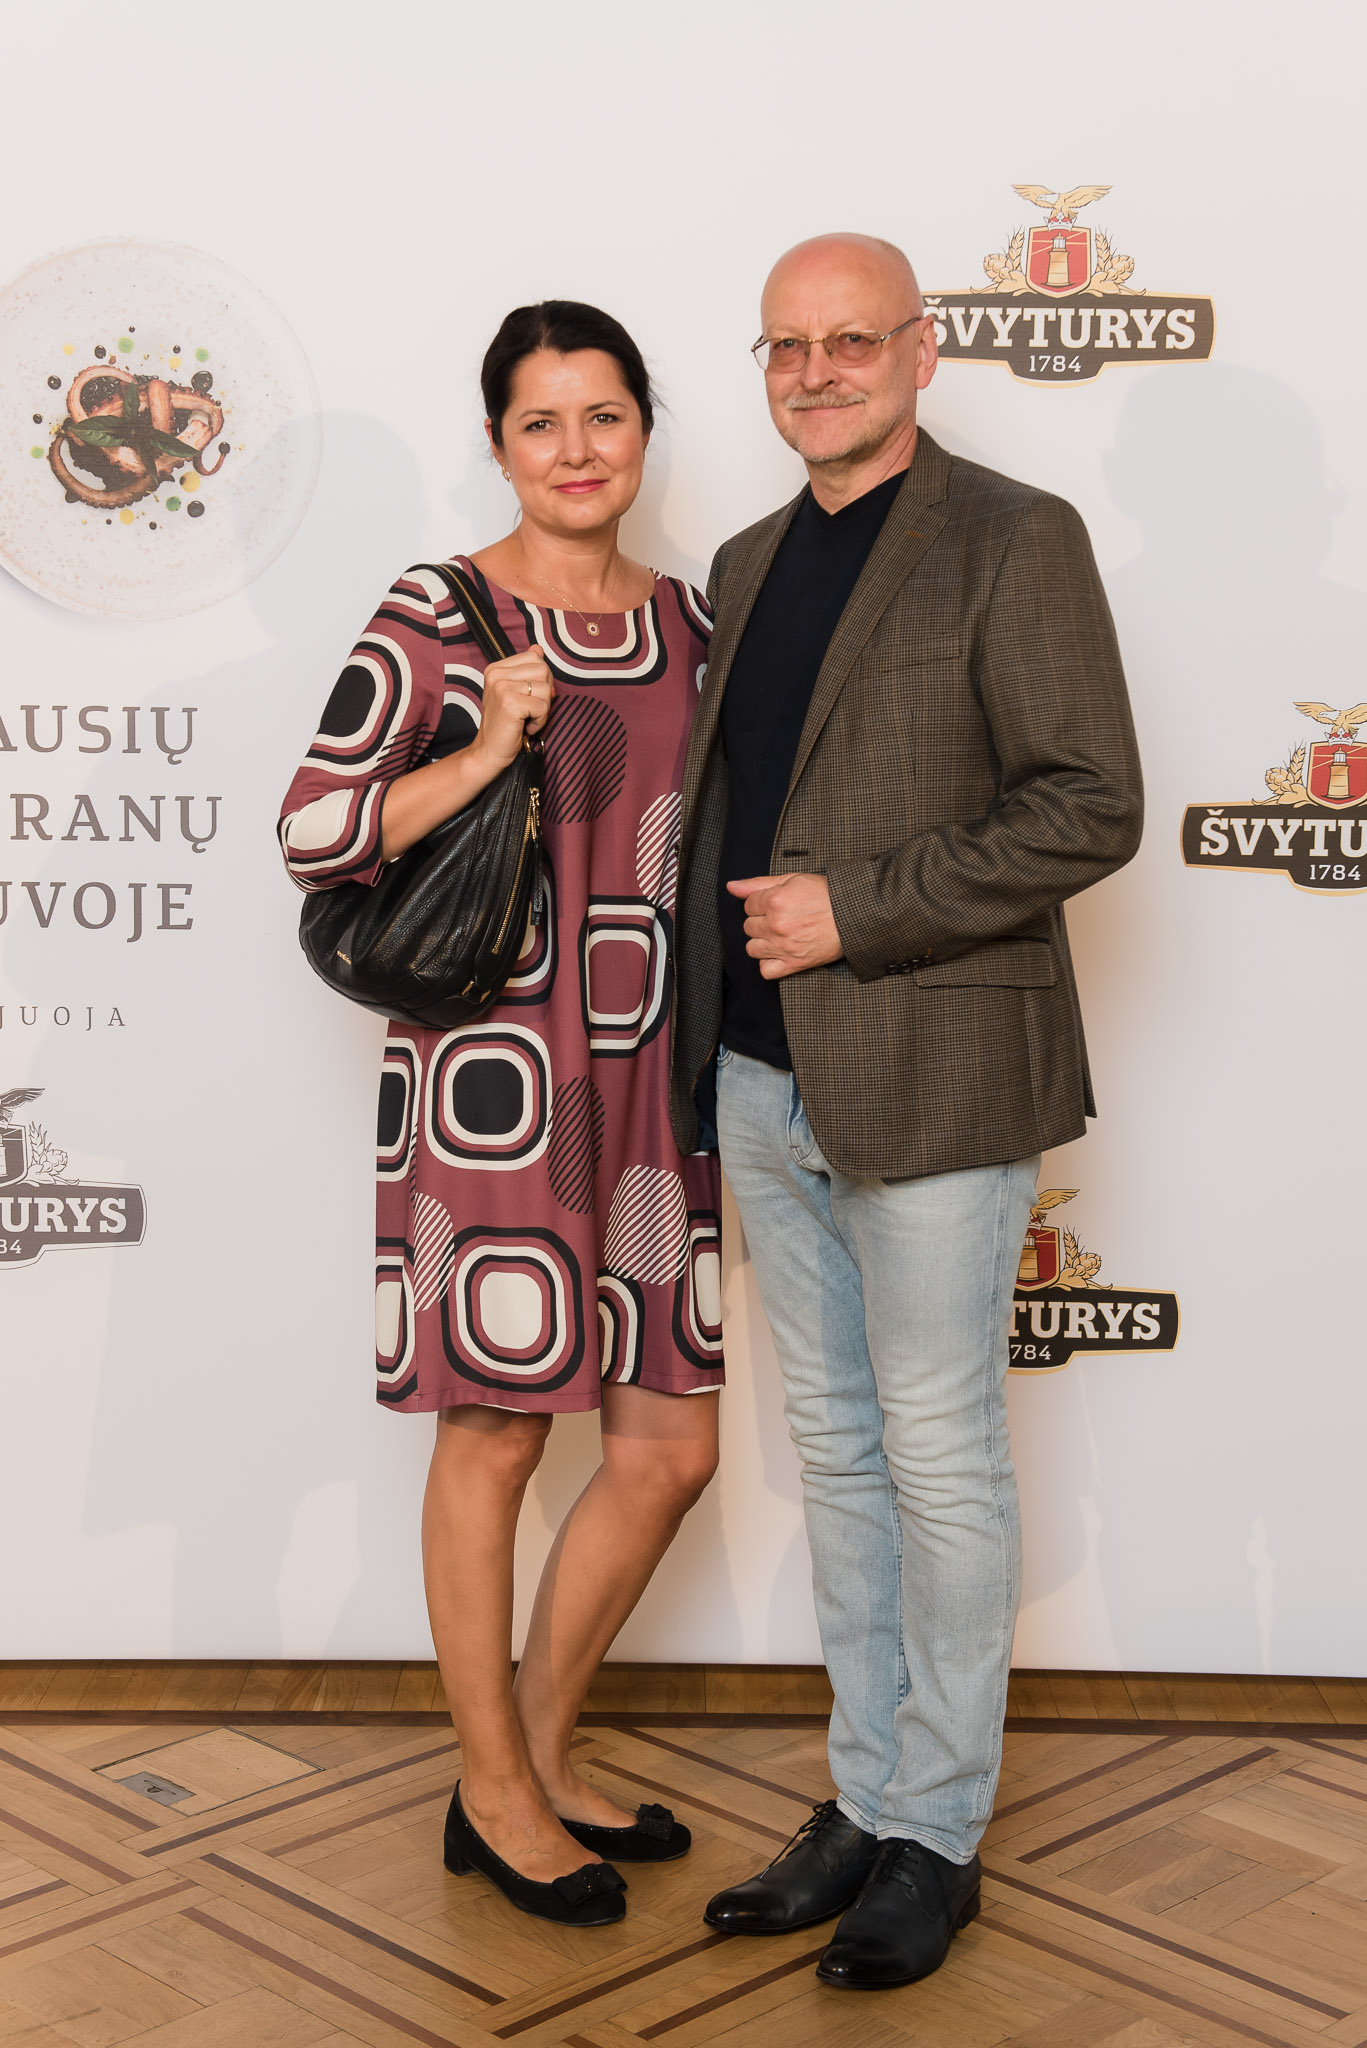 © 2017 Gediminas Grazys photography - www.gediminasgrazys.lt